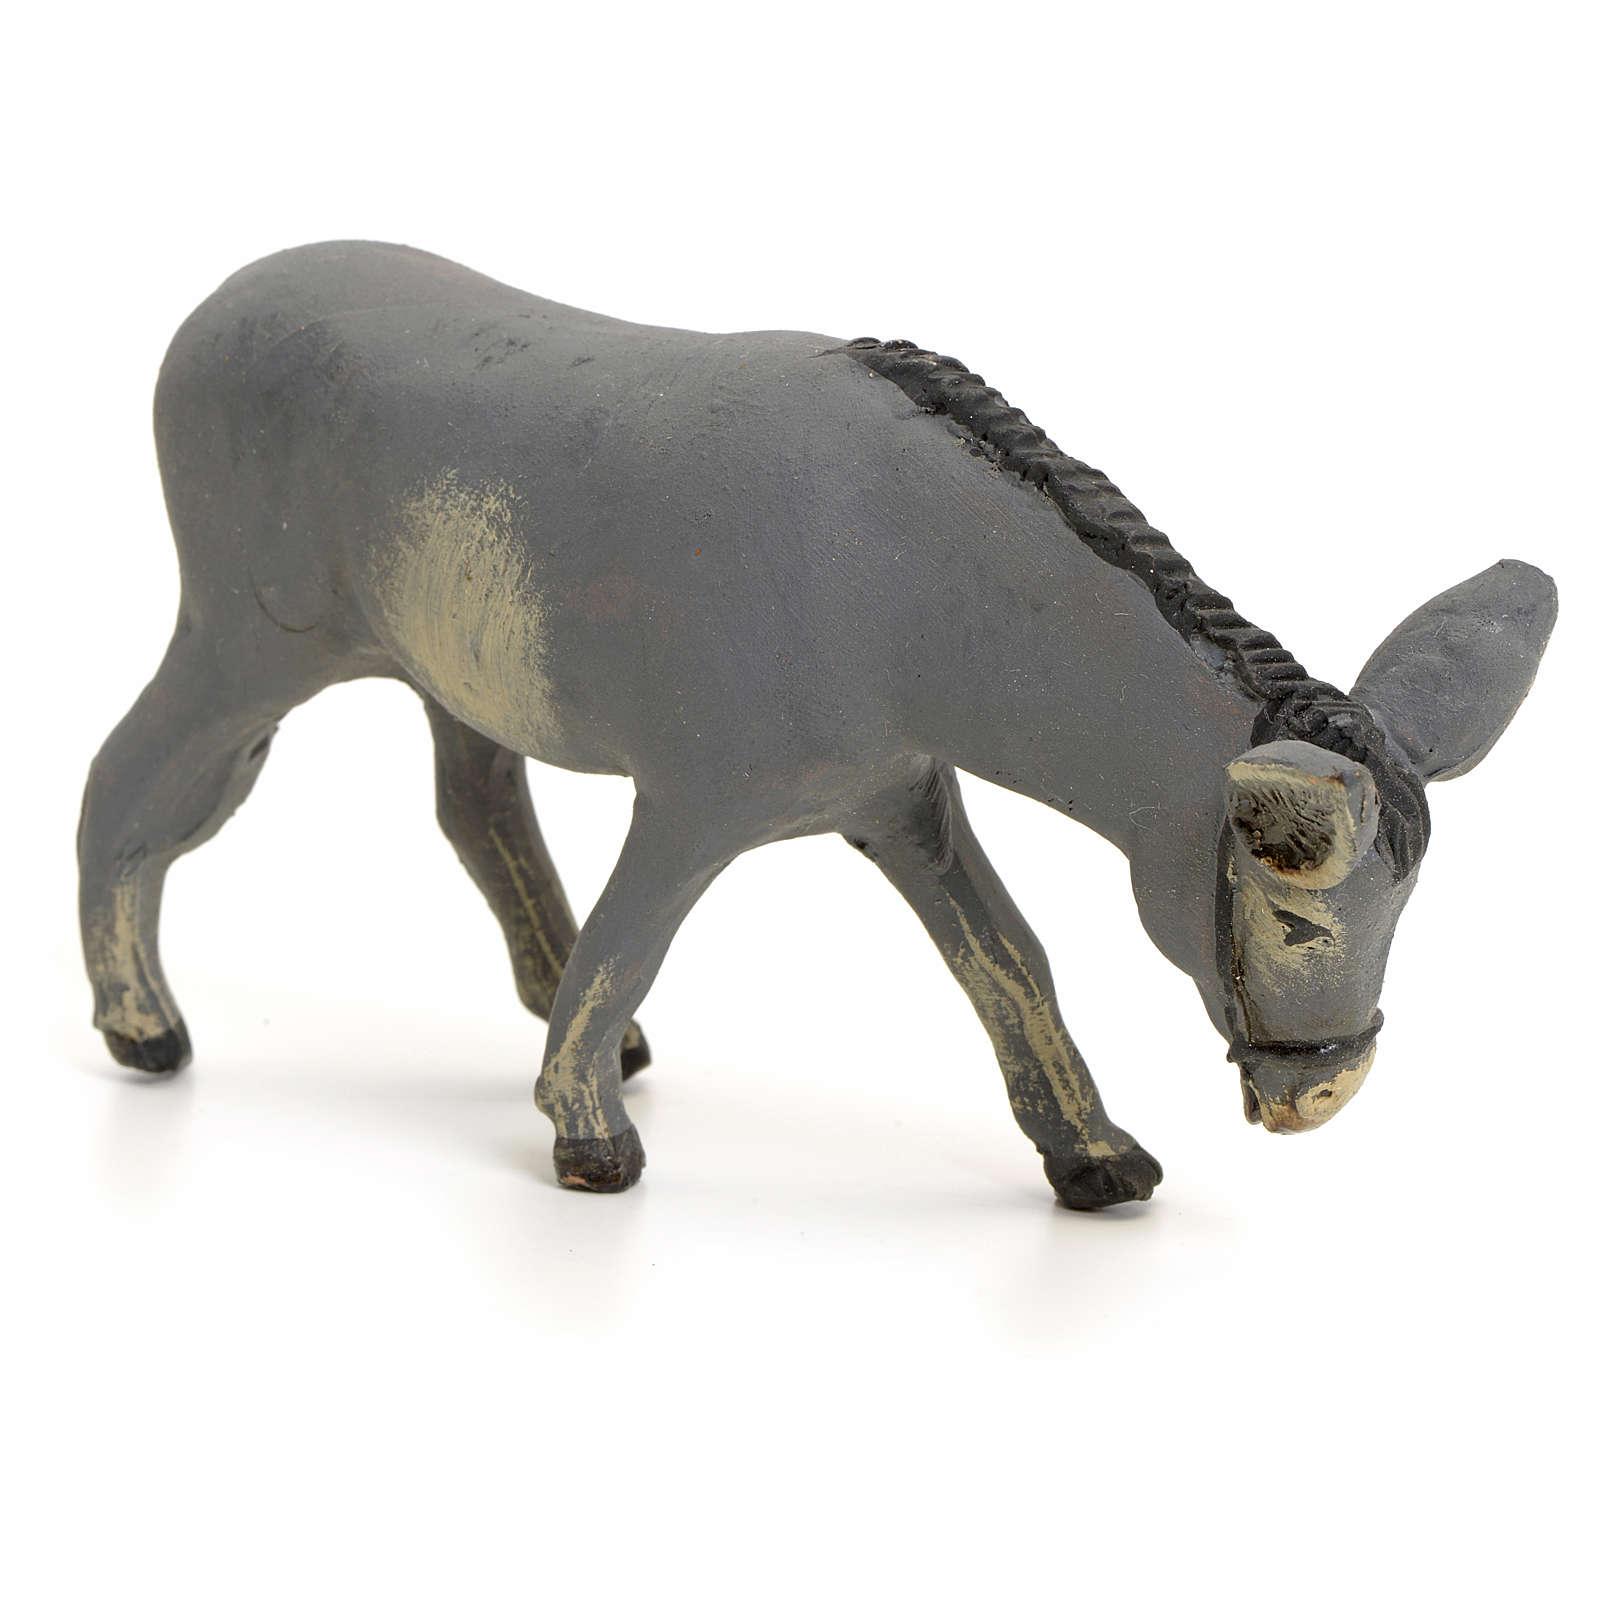 Neapolitan nativity figurine, standing donkey, 8cm 4